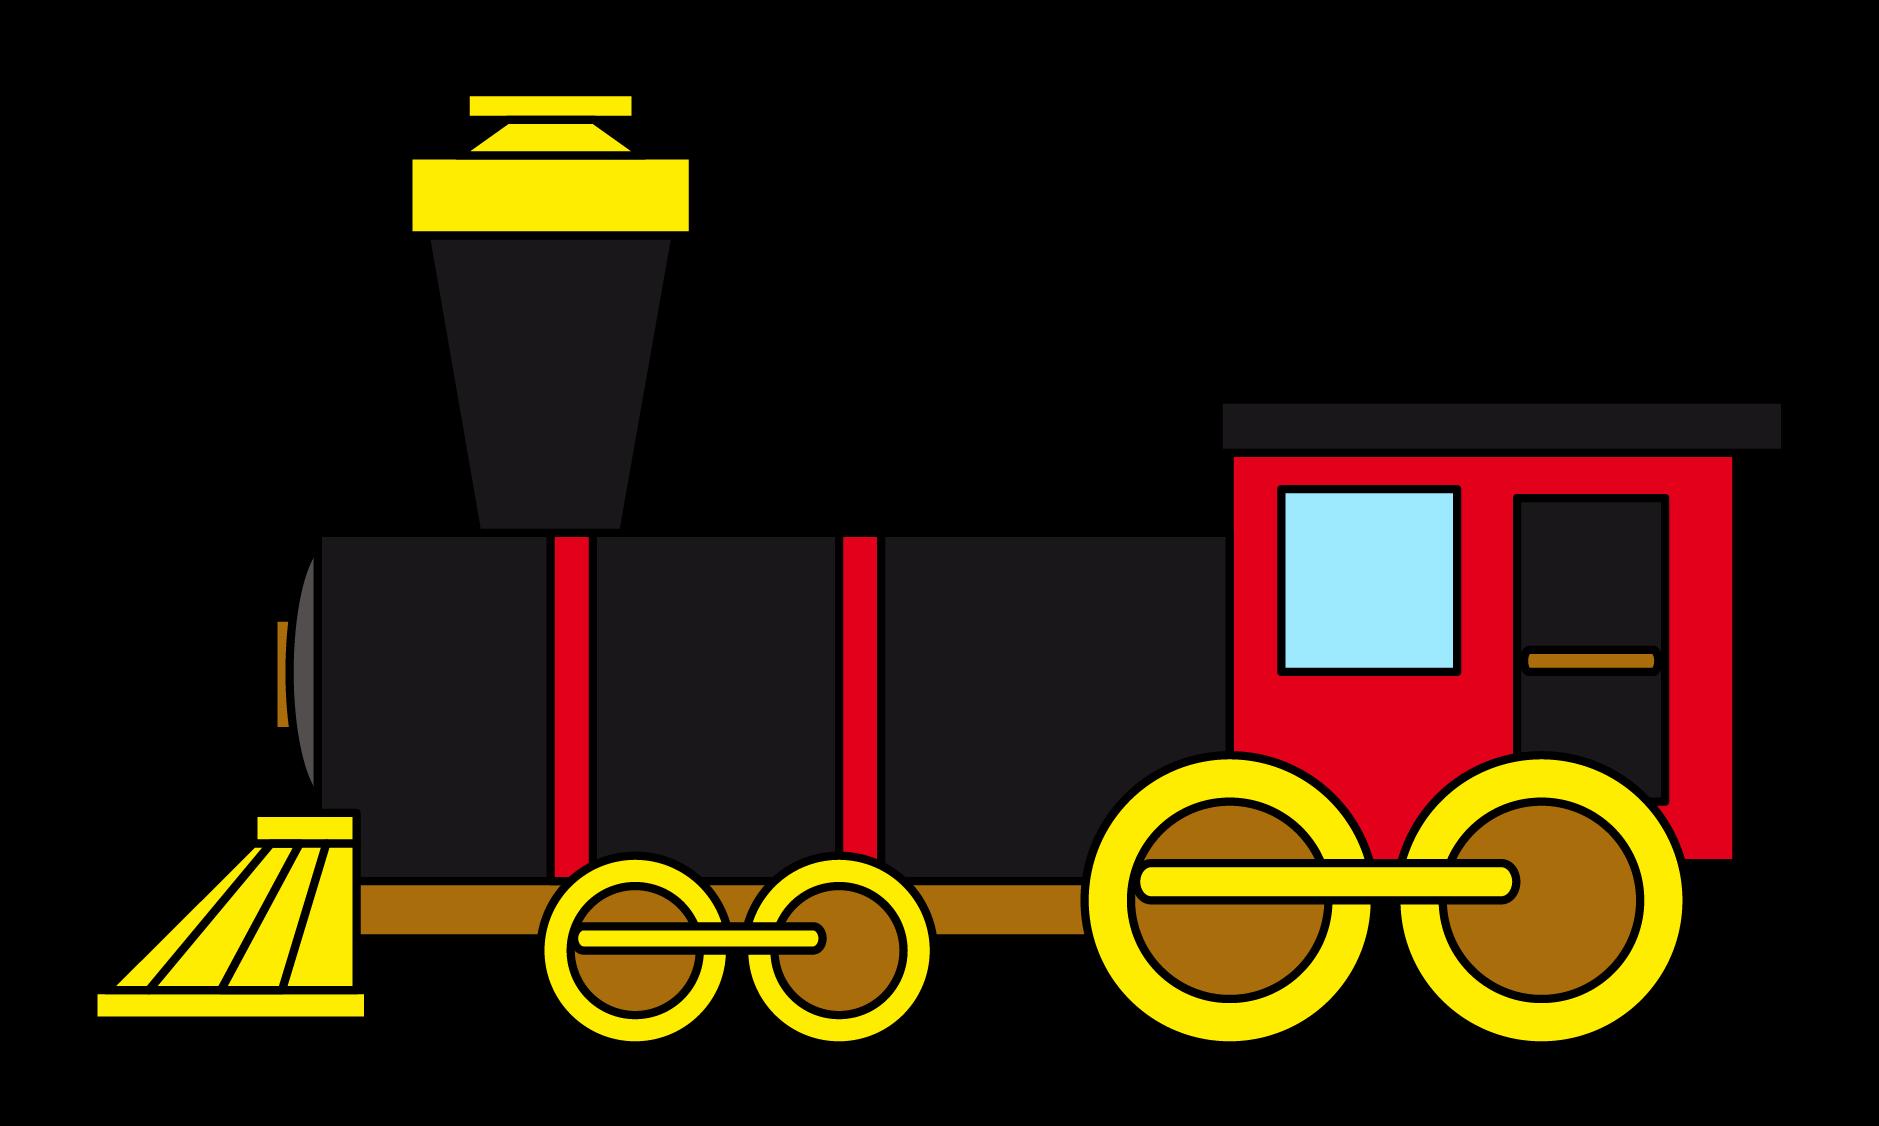 Train free to use clip art 2